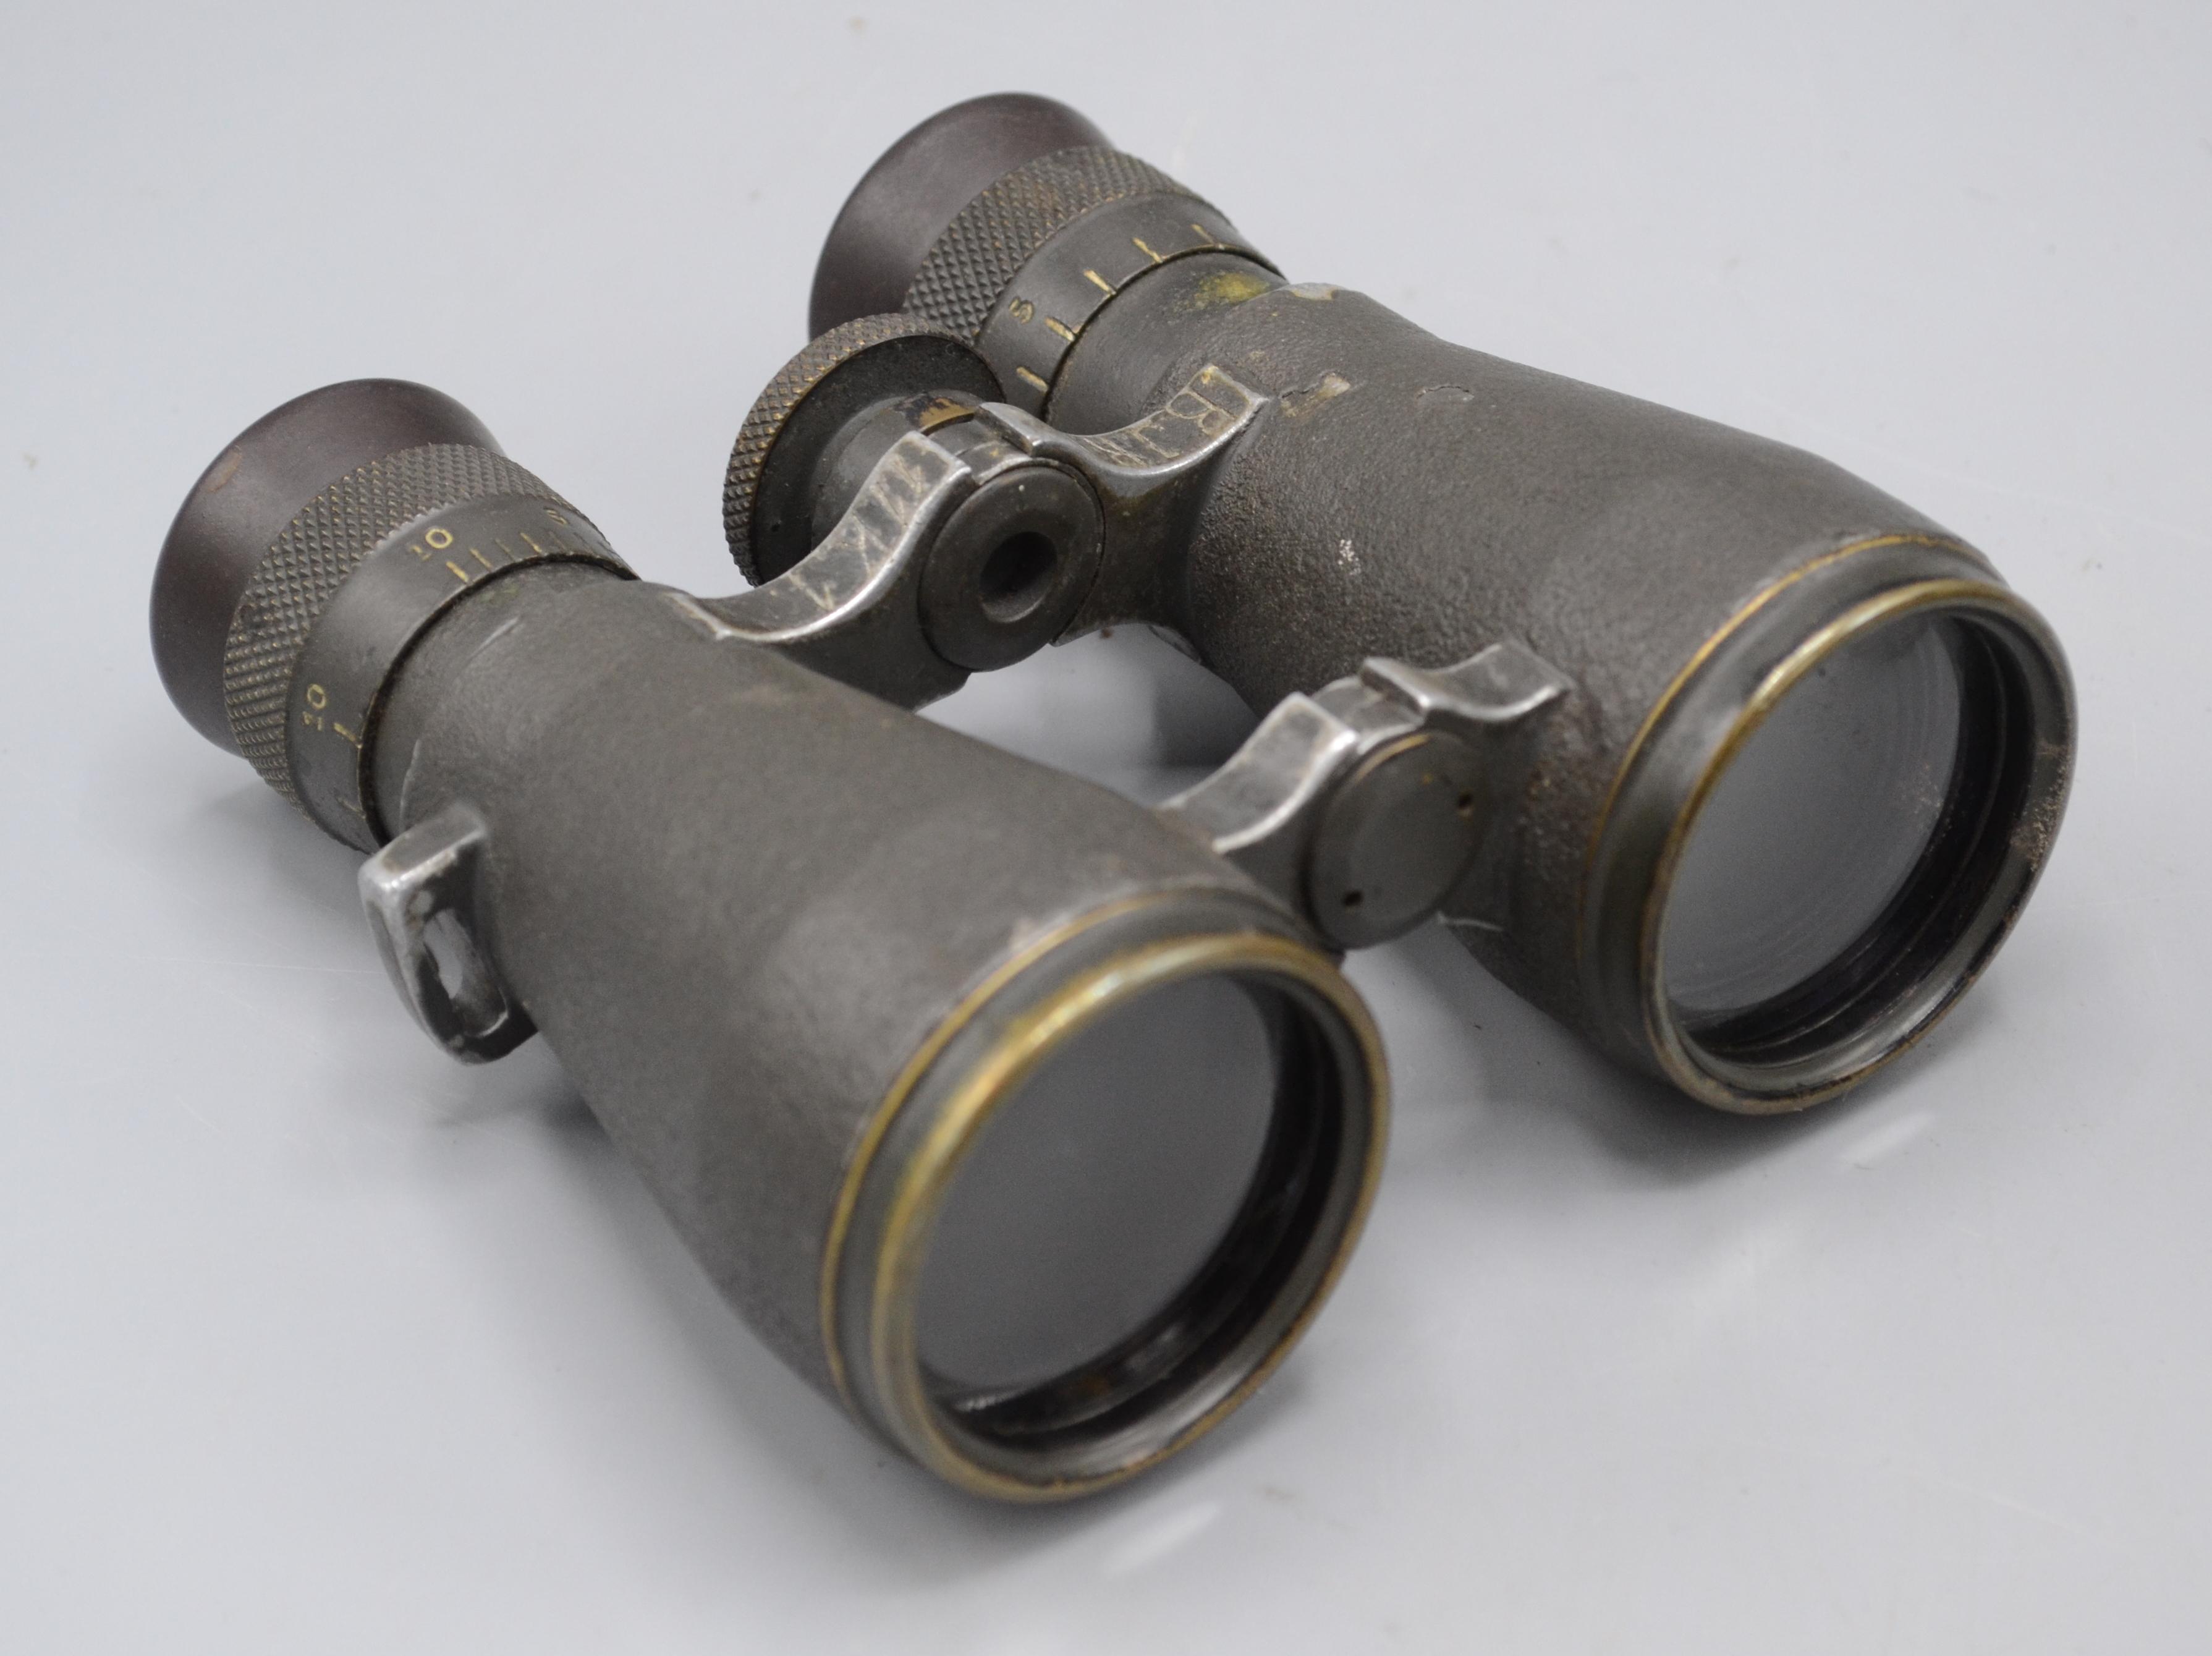 Lot 35 - A pair of German Leitz Wetzler military binoculars, in original leather case, height 11.